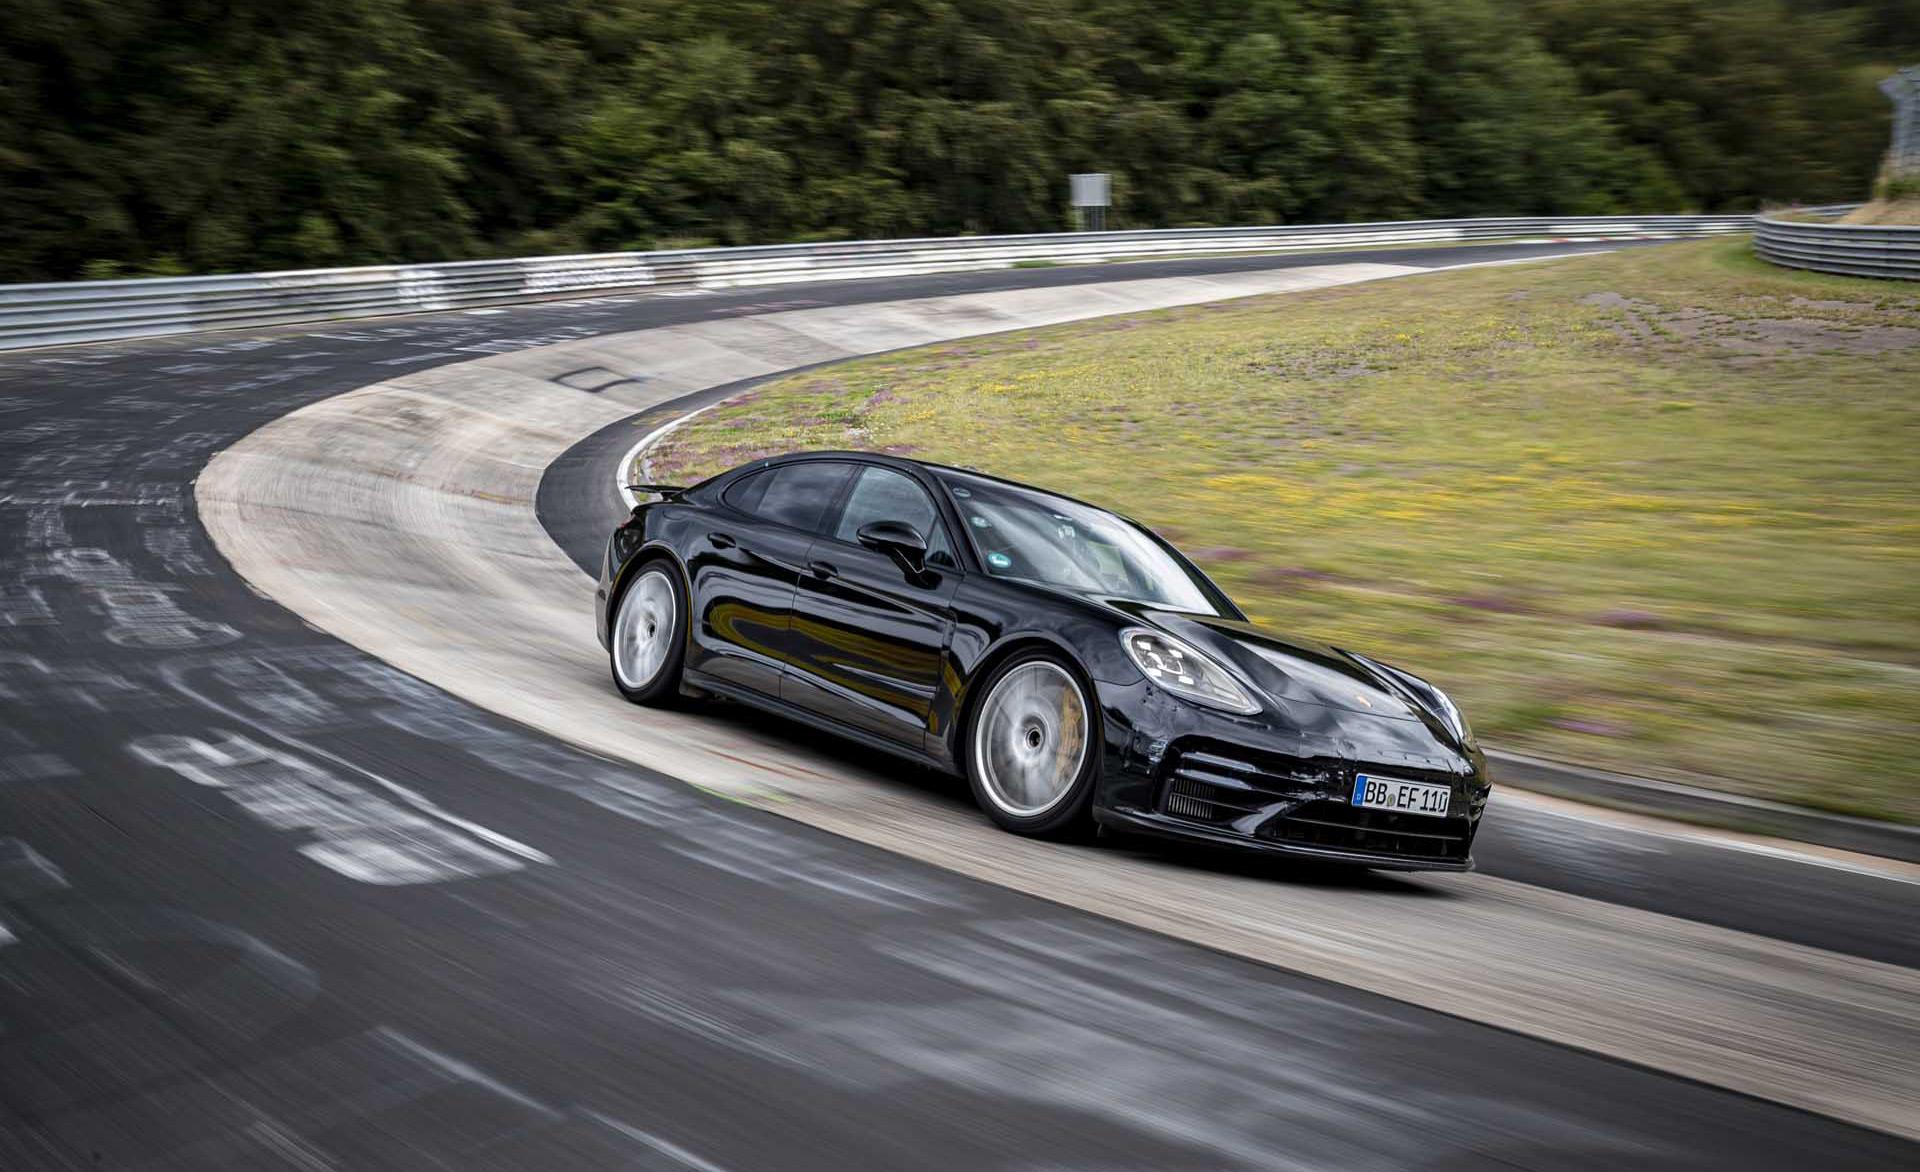 2021 Porsche Panamera laps the 'Ring faster than a C8 Corvette